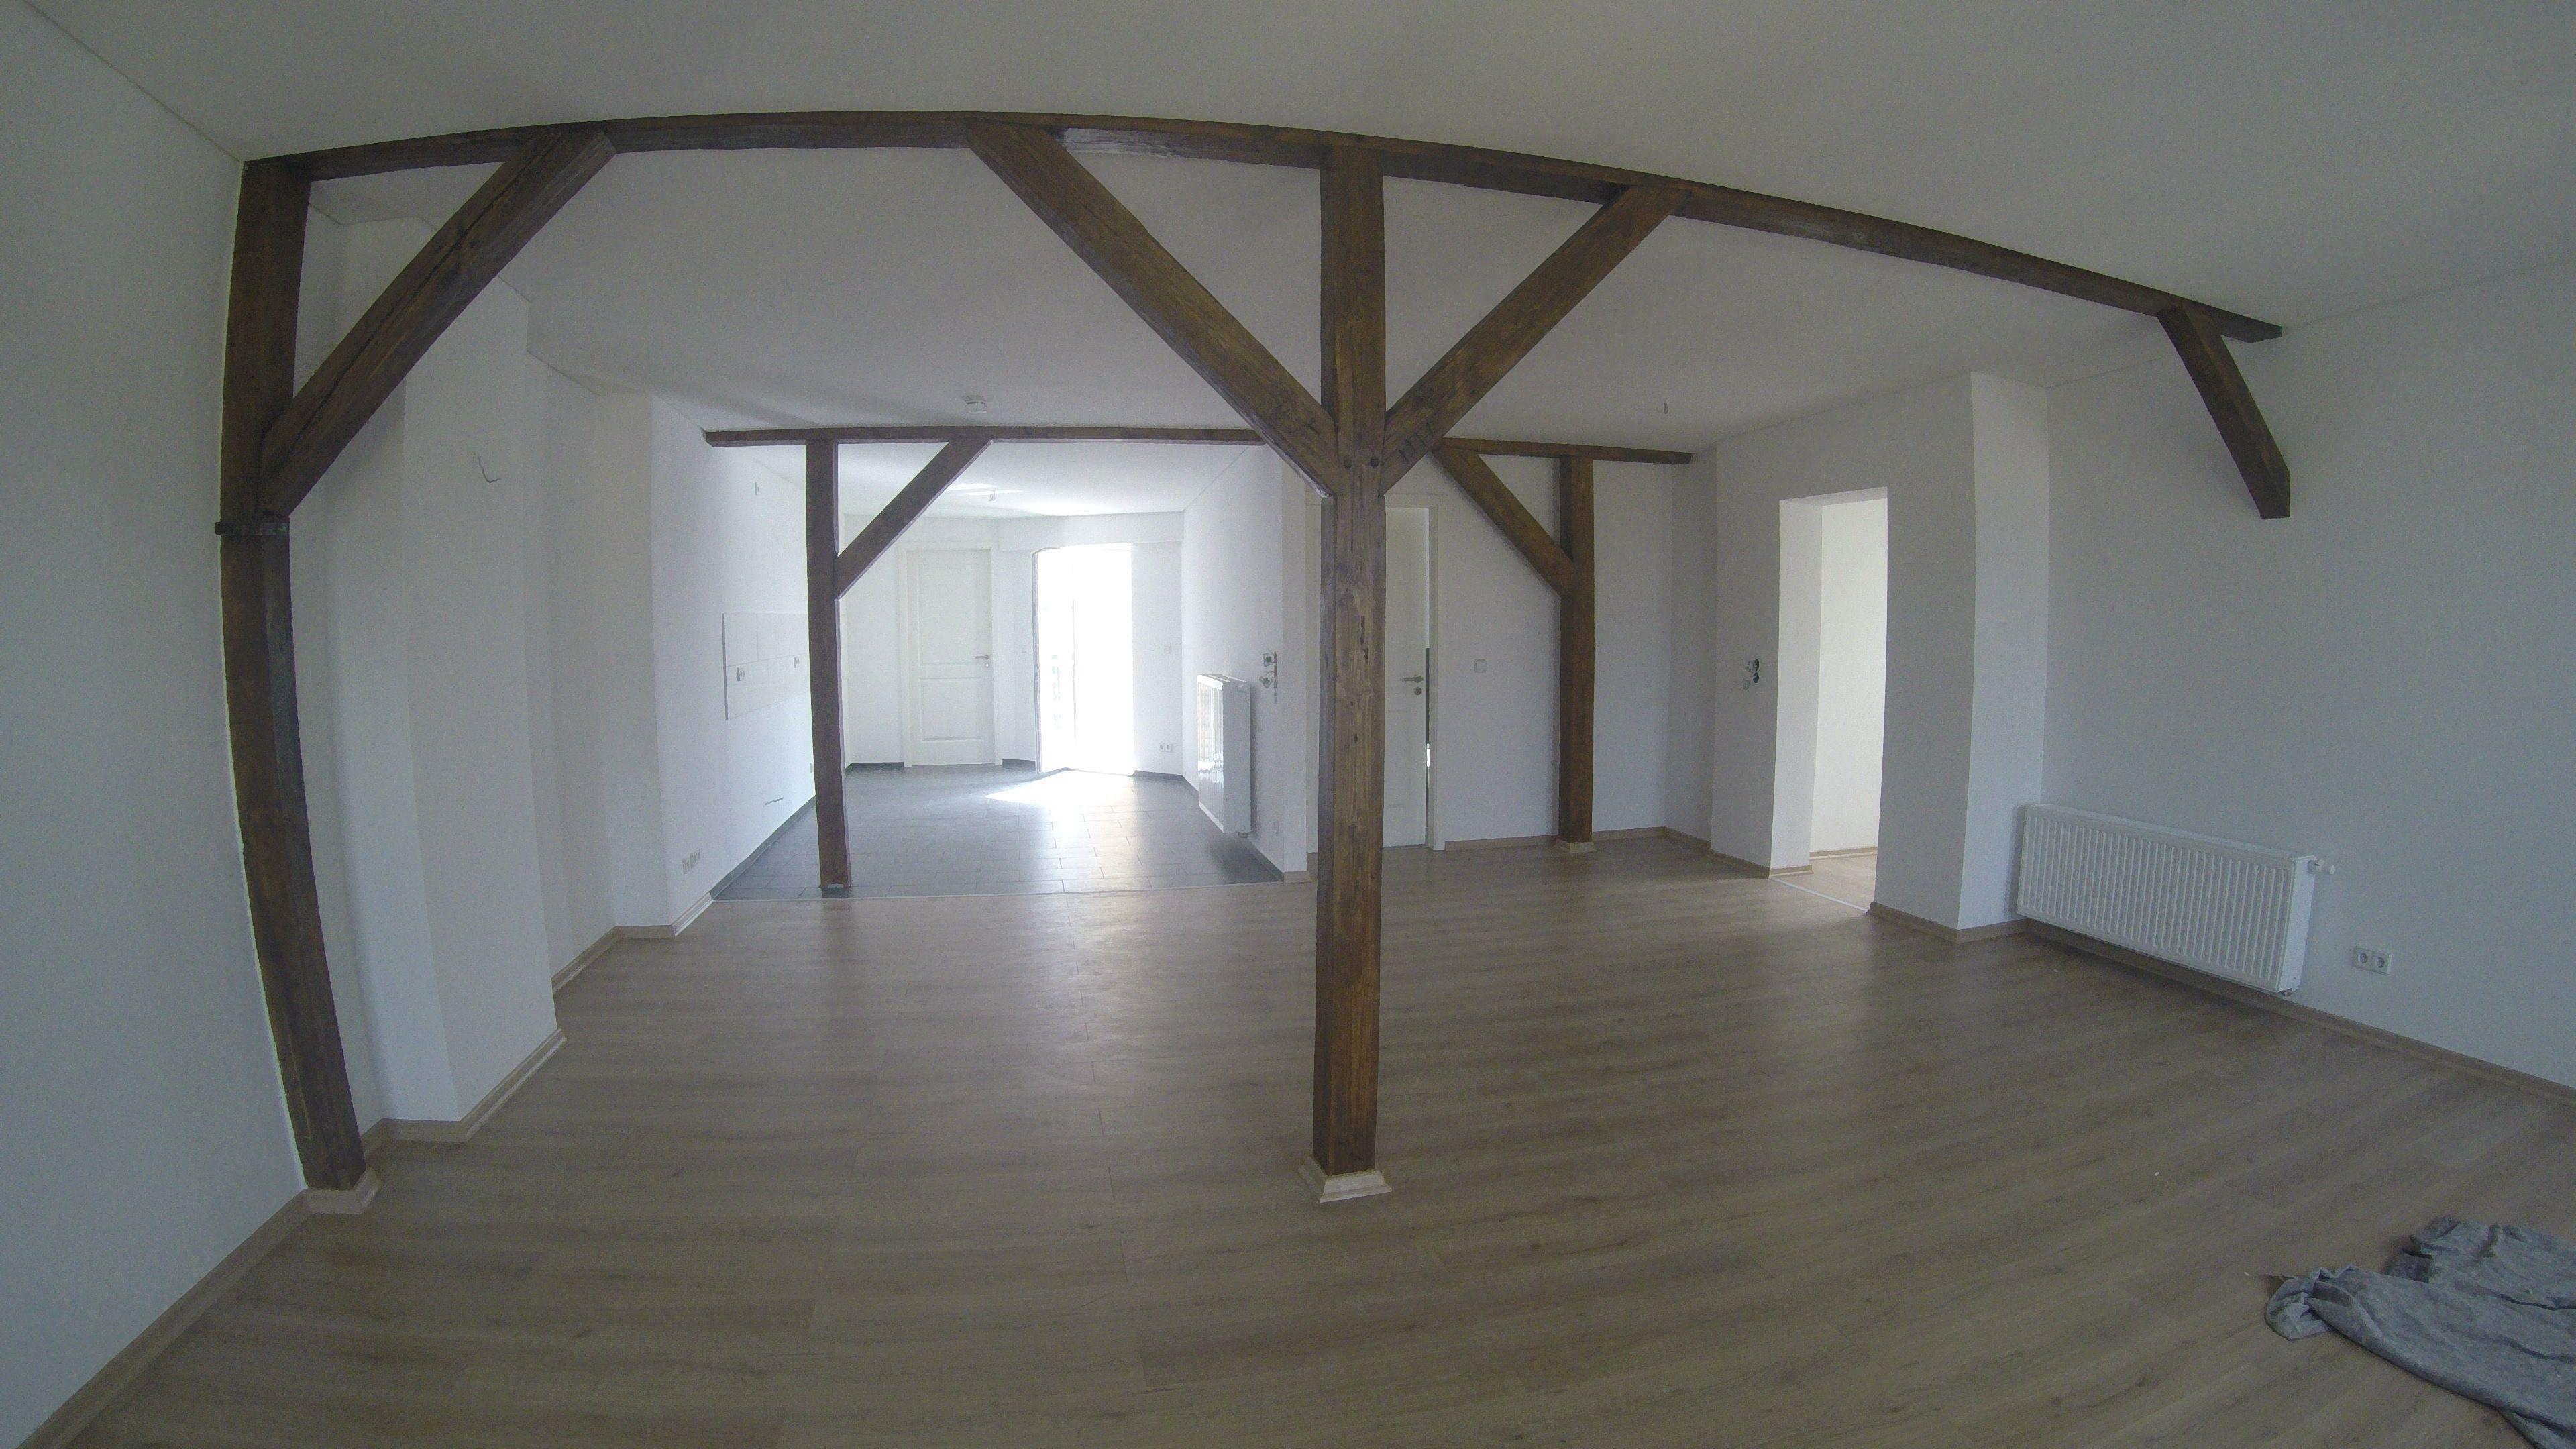 Super Coole 2 Zimmer #Mietwohnung Als #Dachgeschoß ähnlichen #Loft